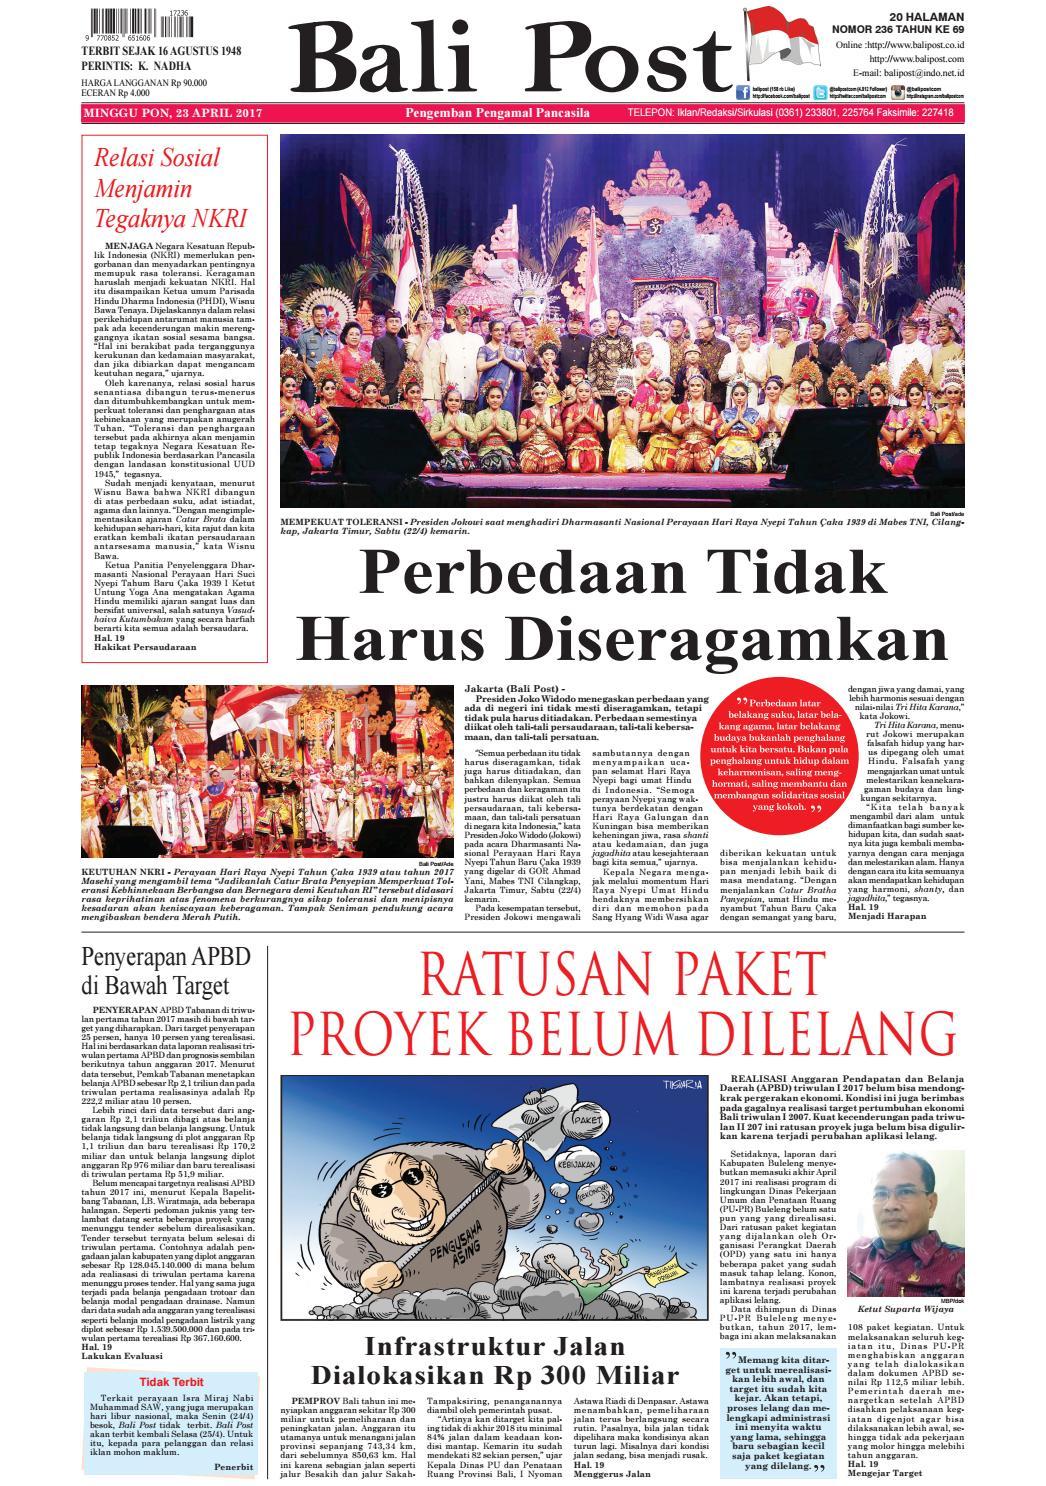 Edisi 23 April 2017 Balipostcom By E Paper KMB Issuu